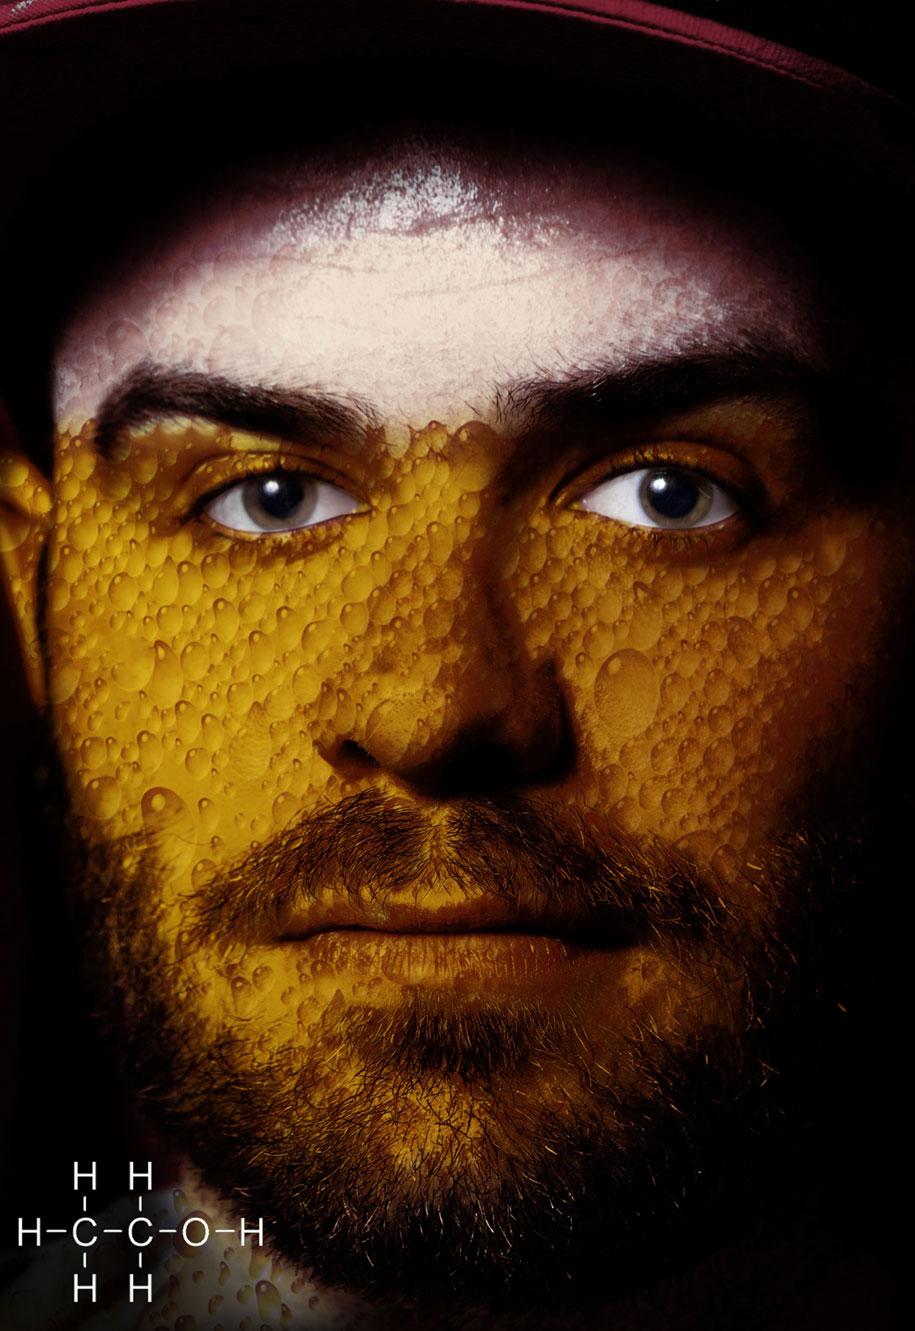 people-using-drugs-portraits-inebrination-les-baker-v-6